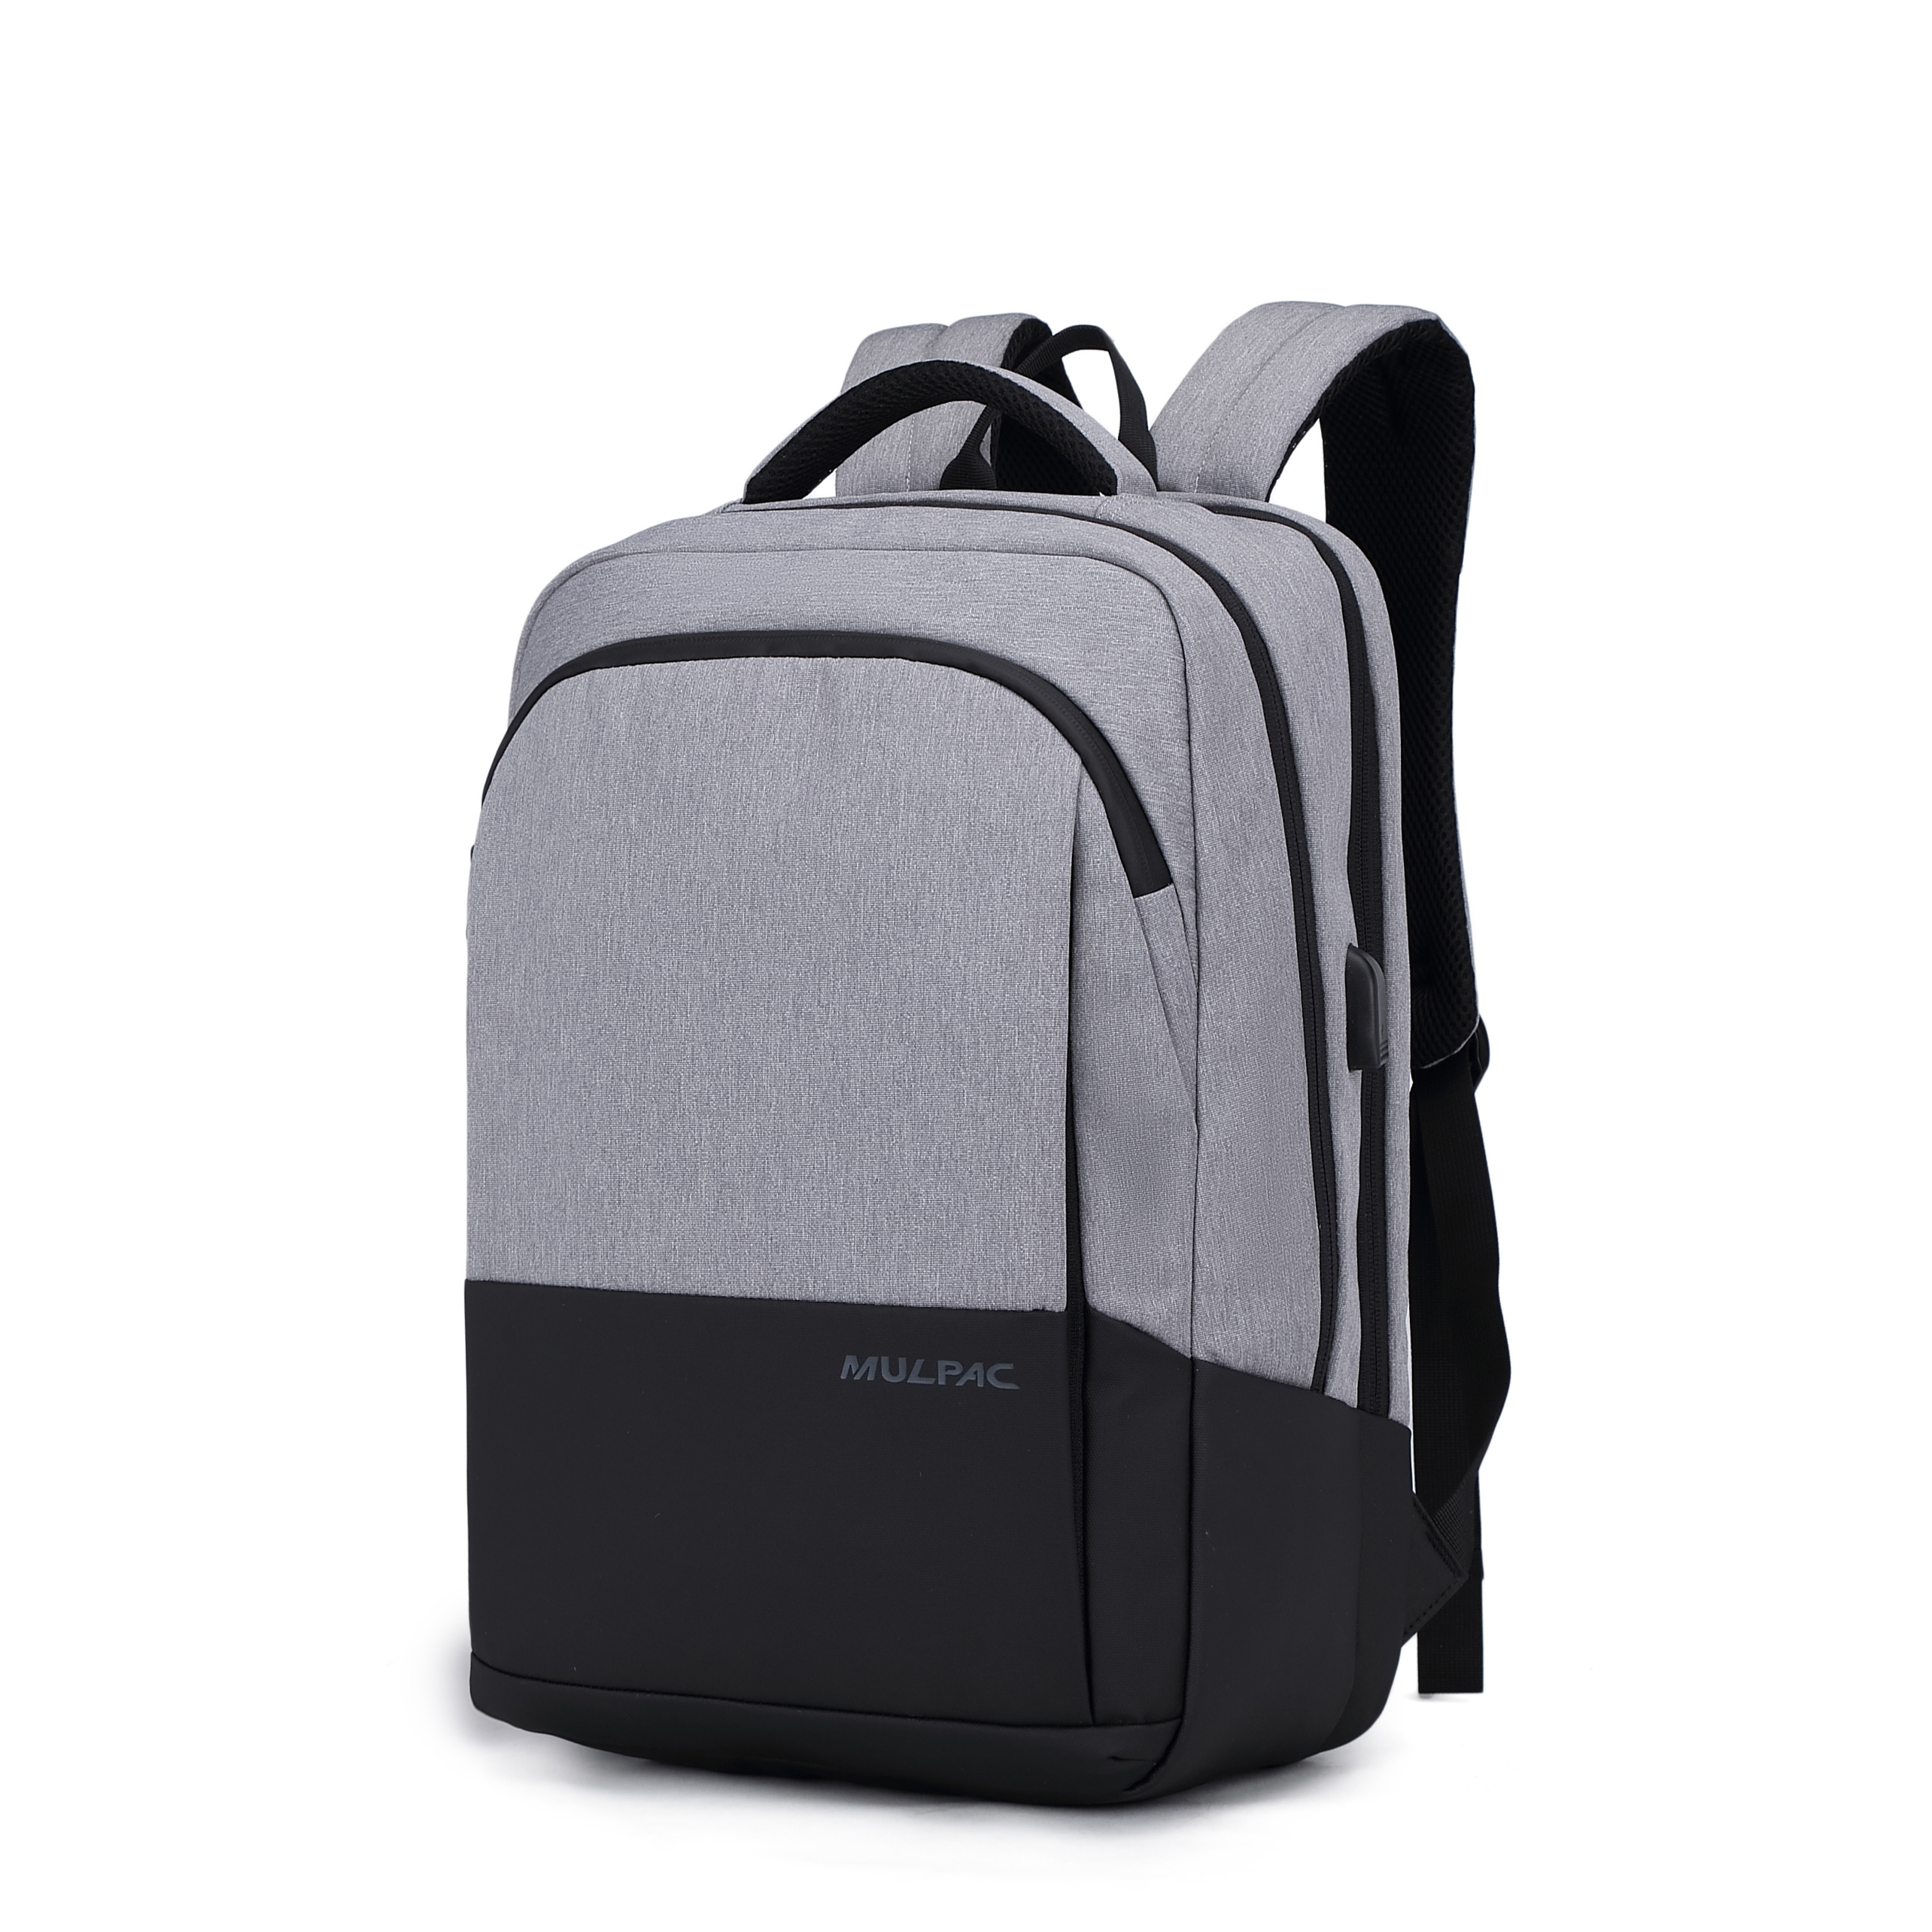 USB Computer Backpack KEBI Waterproof Computer Backpack USB Computer Backpack